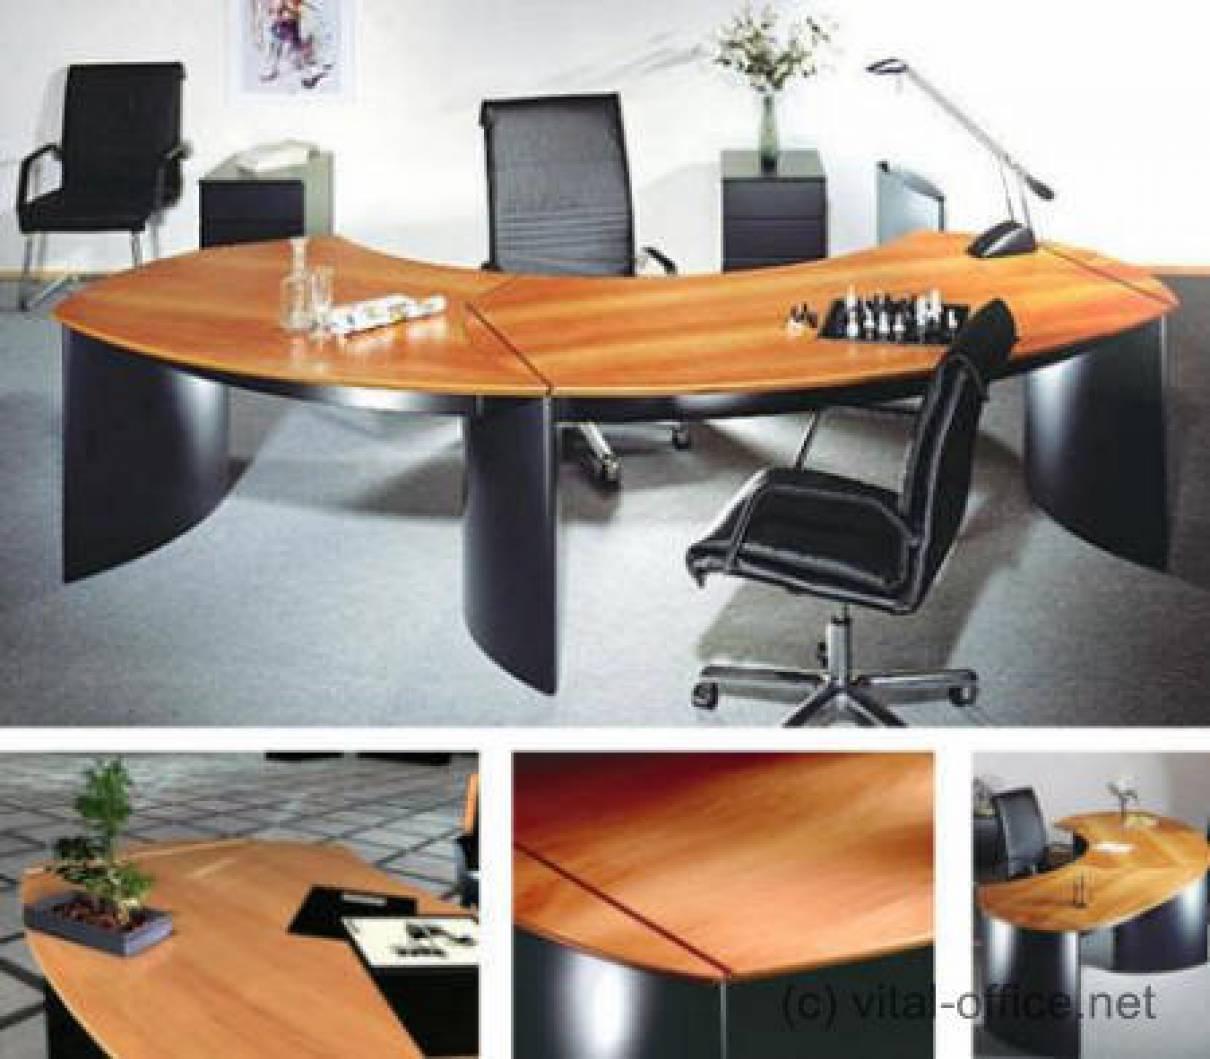 Circon Classic executive desk Design-Classics in anthropometric ...